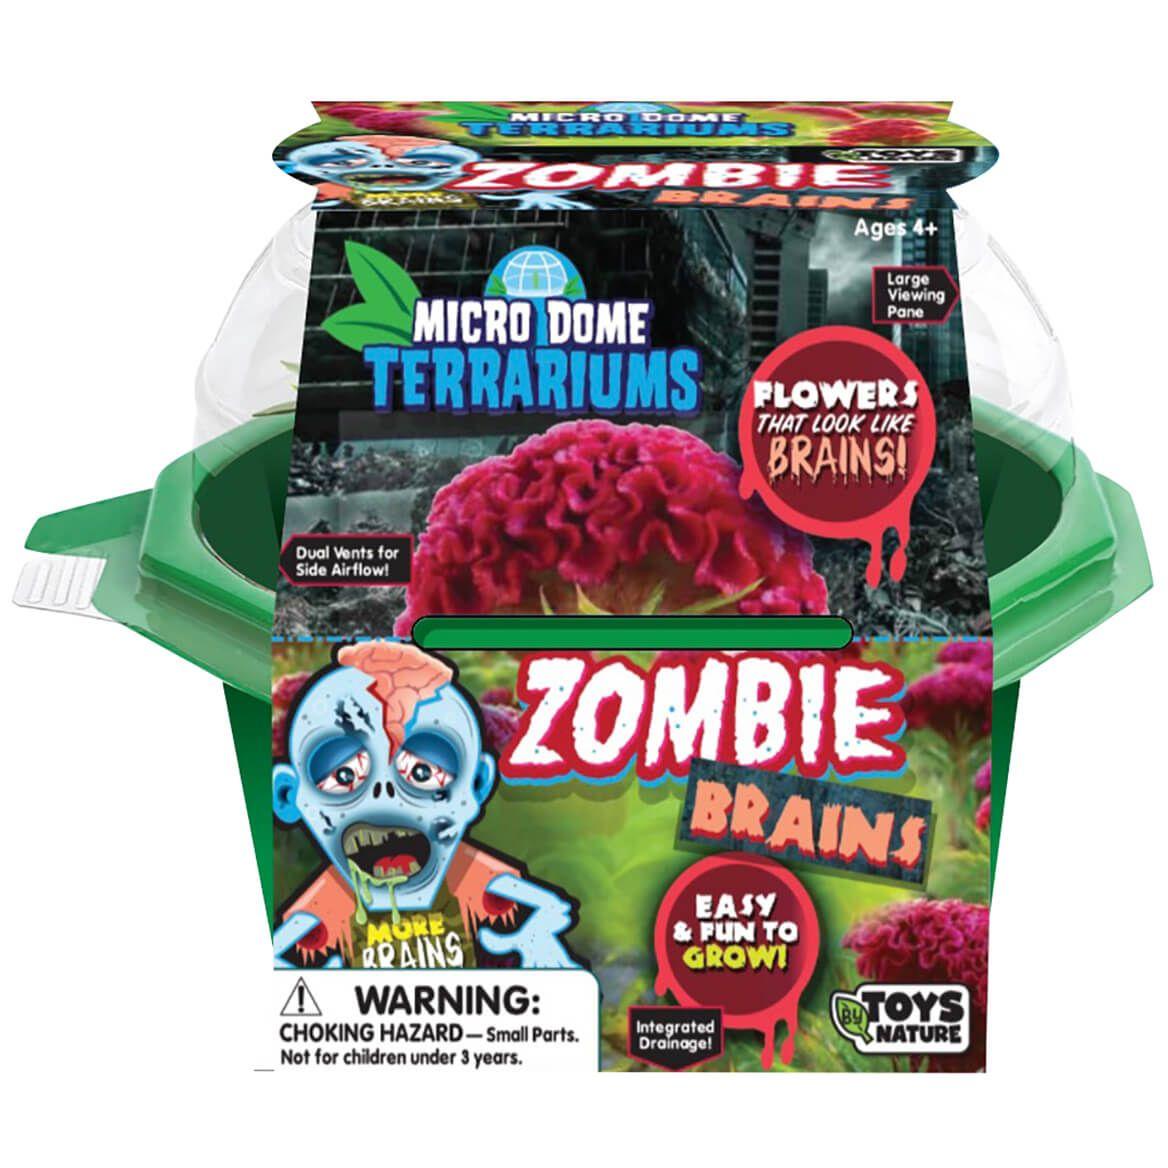 Zombie Brains Micro Dome Terrarium-372317